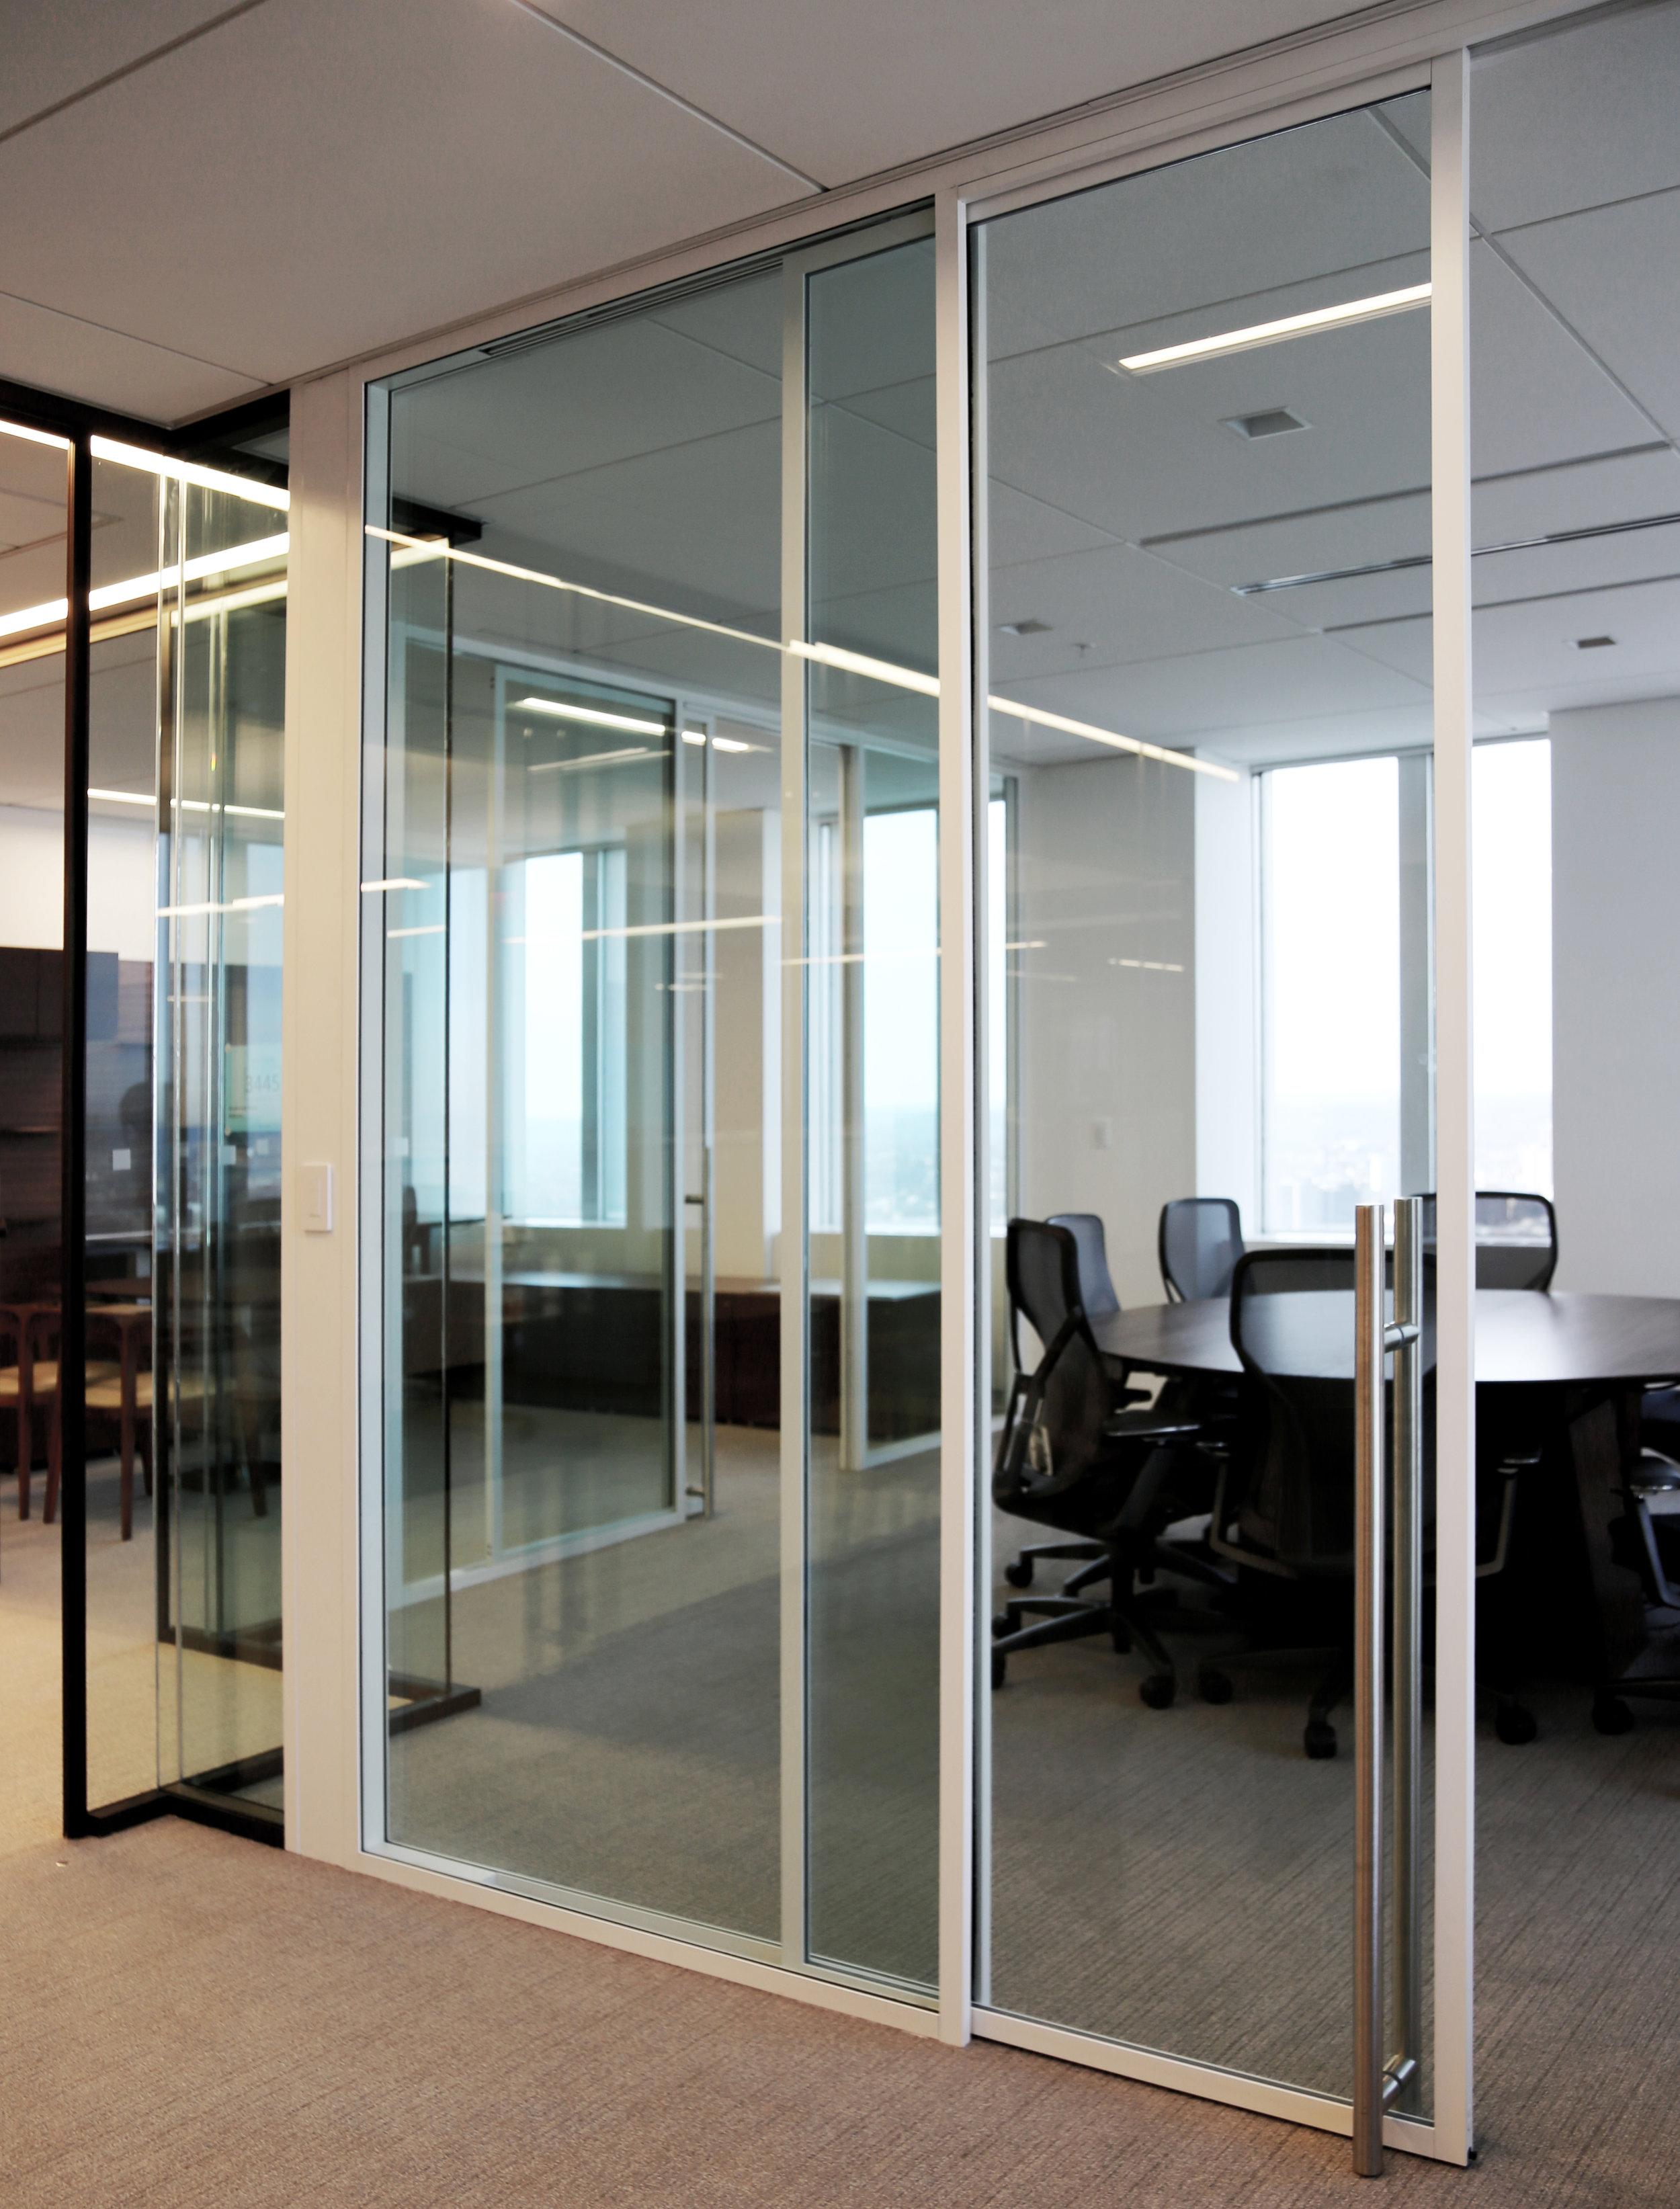 Modernus Dual Pane Conference Room Sliding Door Wall - Spaceworks AI.jpg